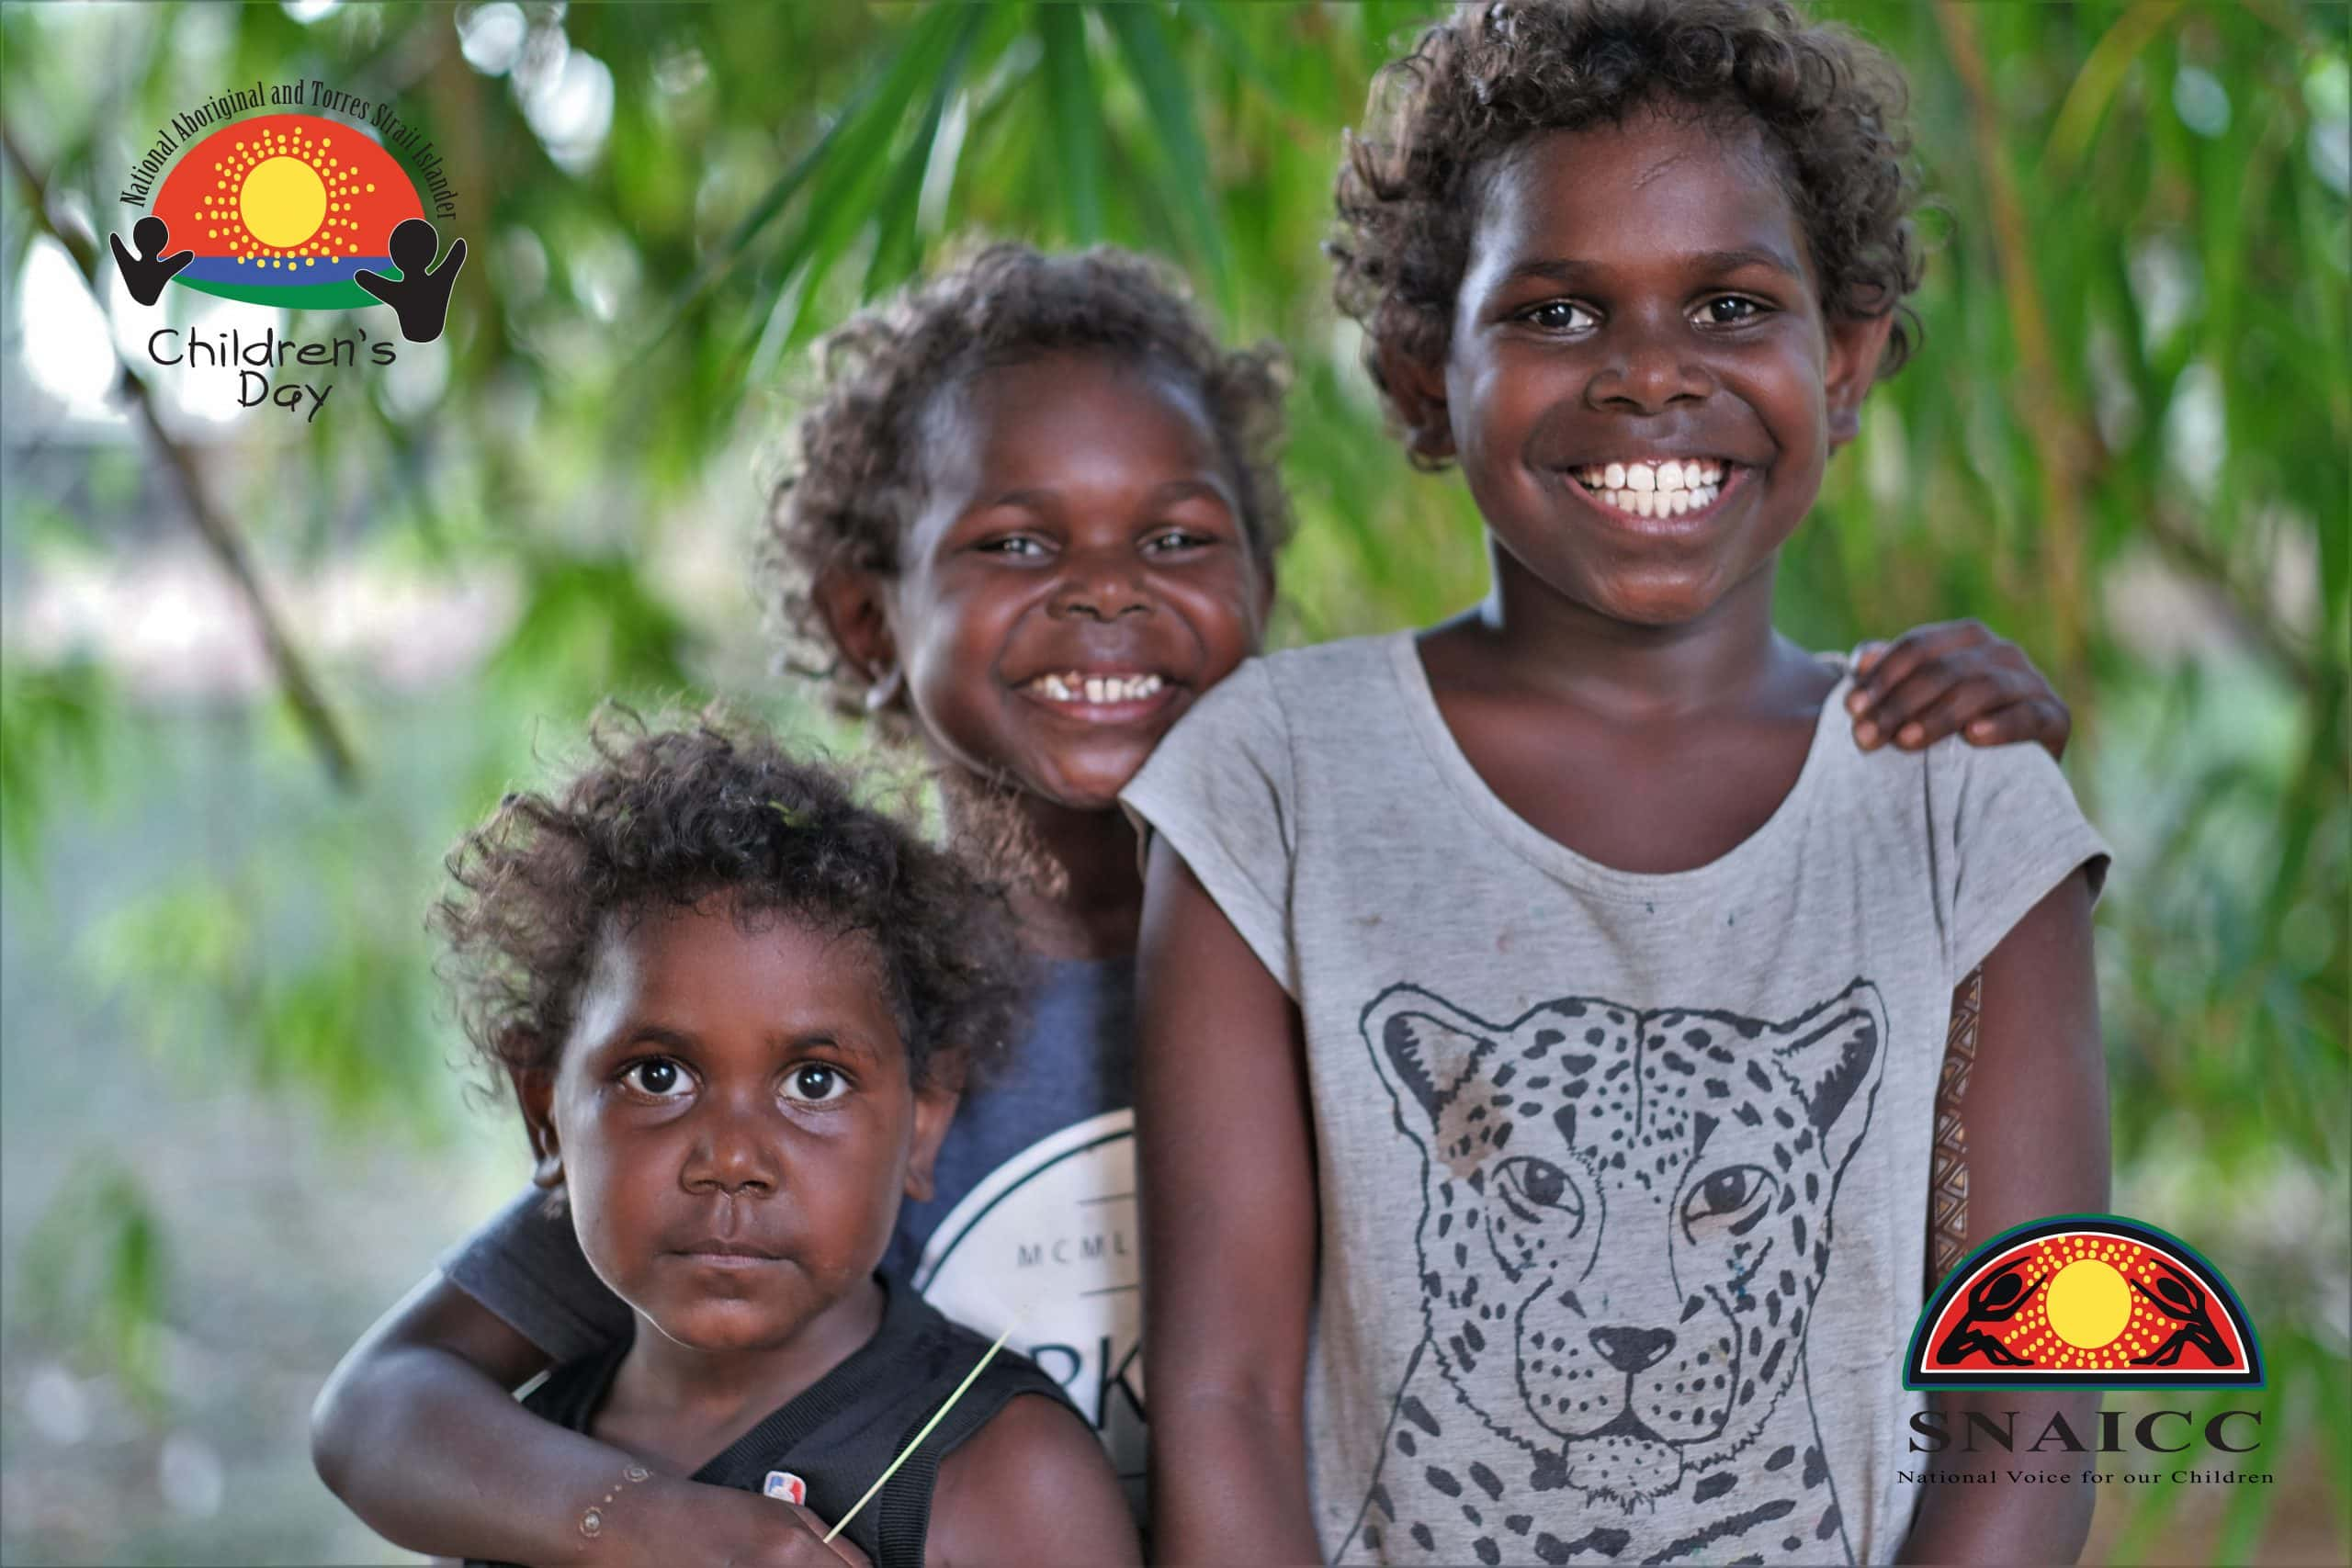 Indigenous Australian children